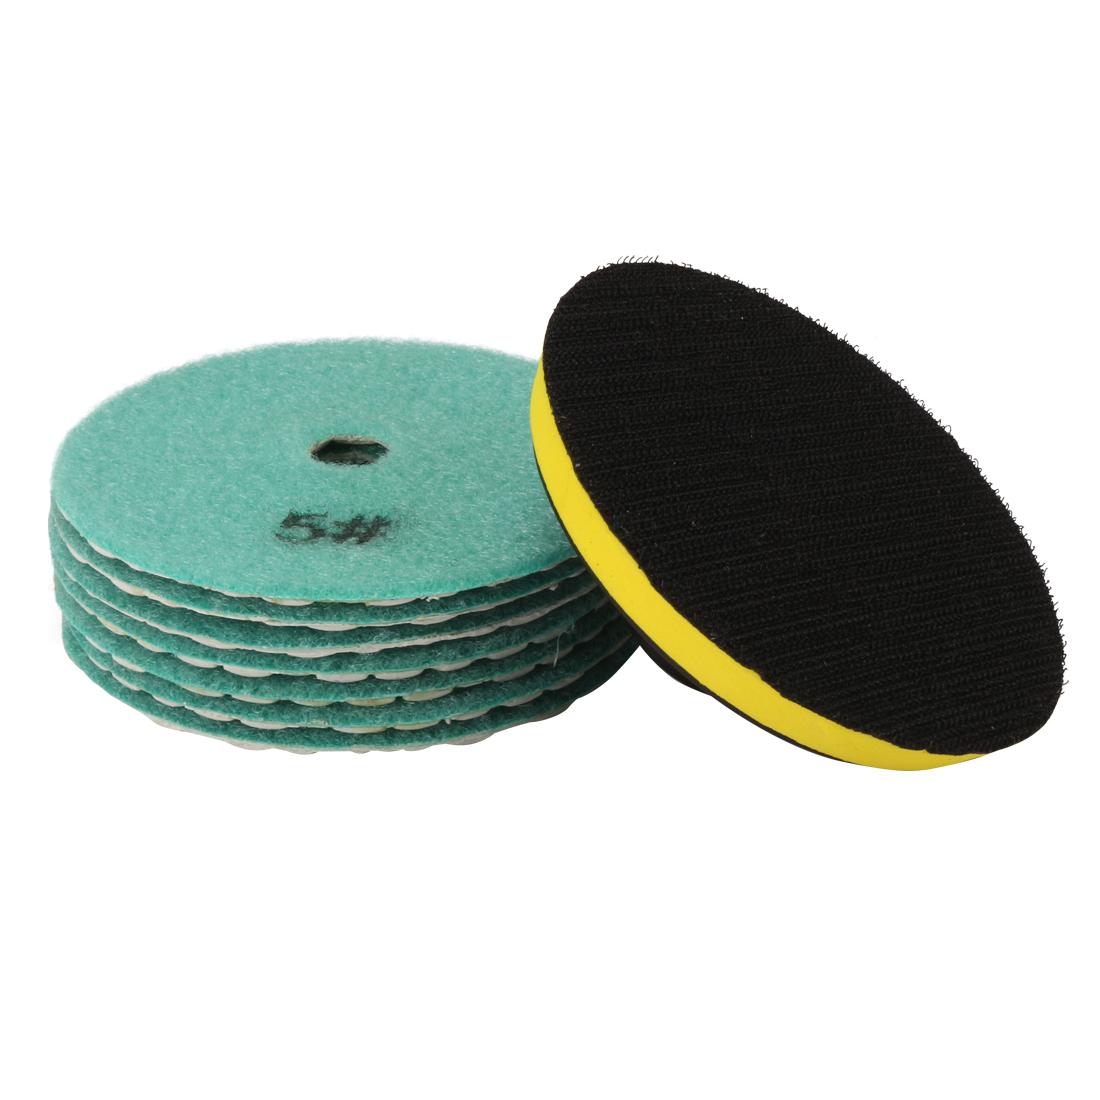 "4"" Diamond Dry Polishing Pad Grit 2000 7PCS for Sanding Marble Granite Stone"